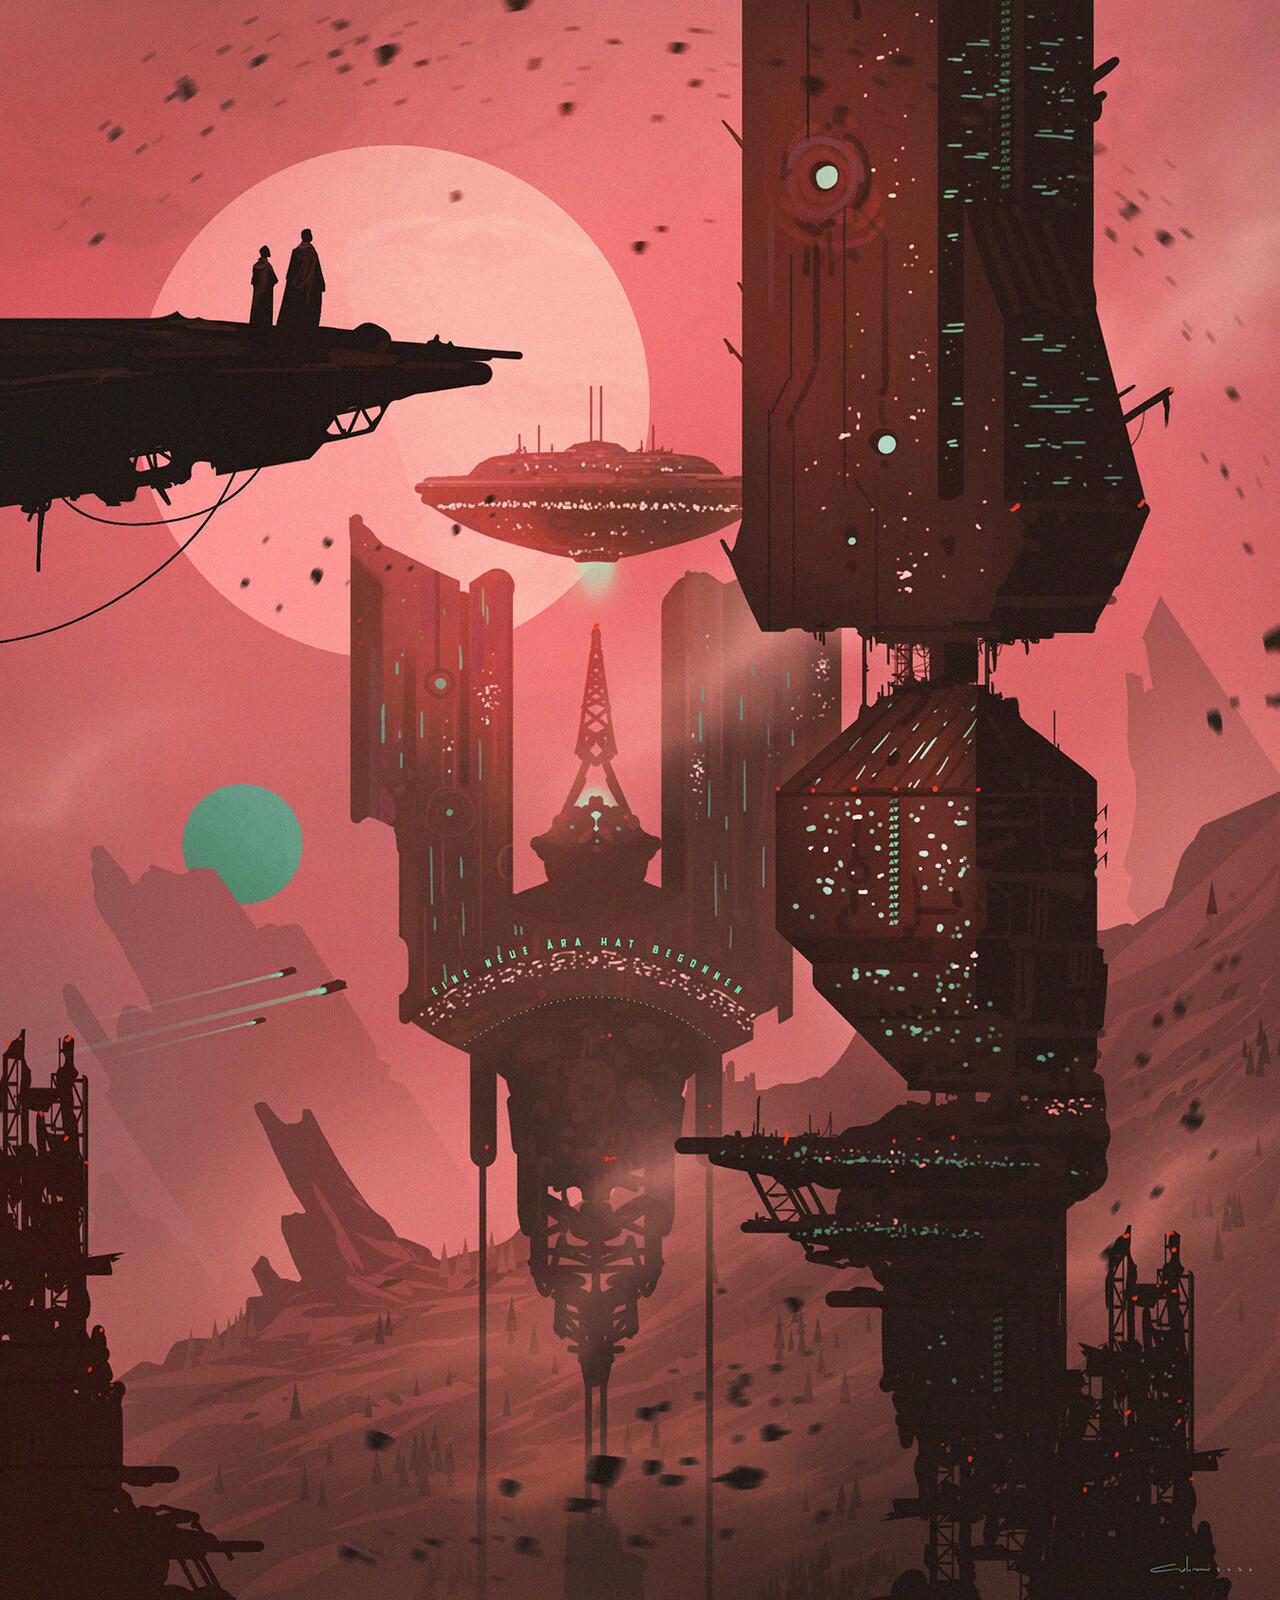 Planet X - Scifi Environment Design